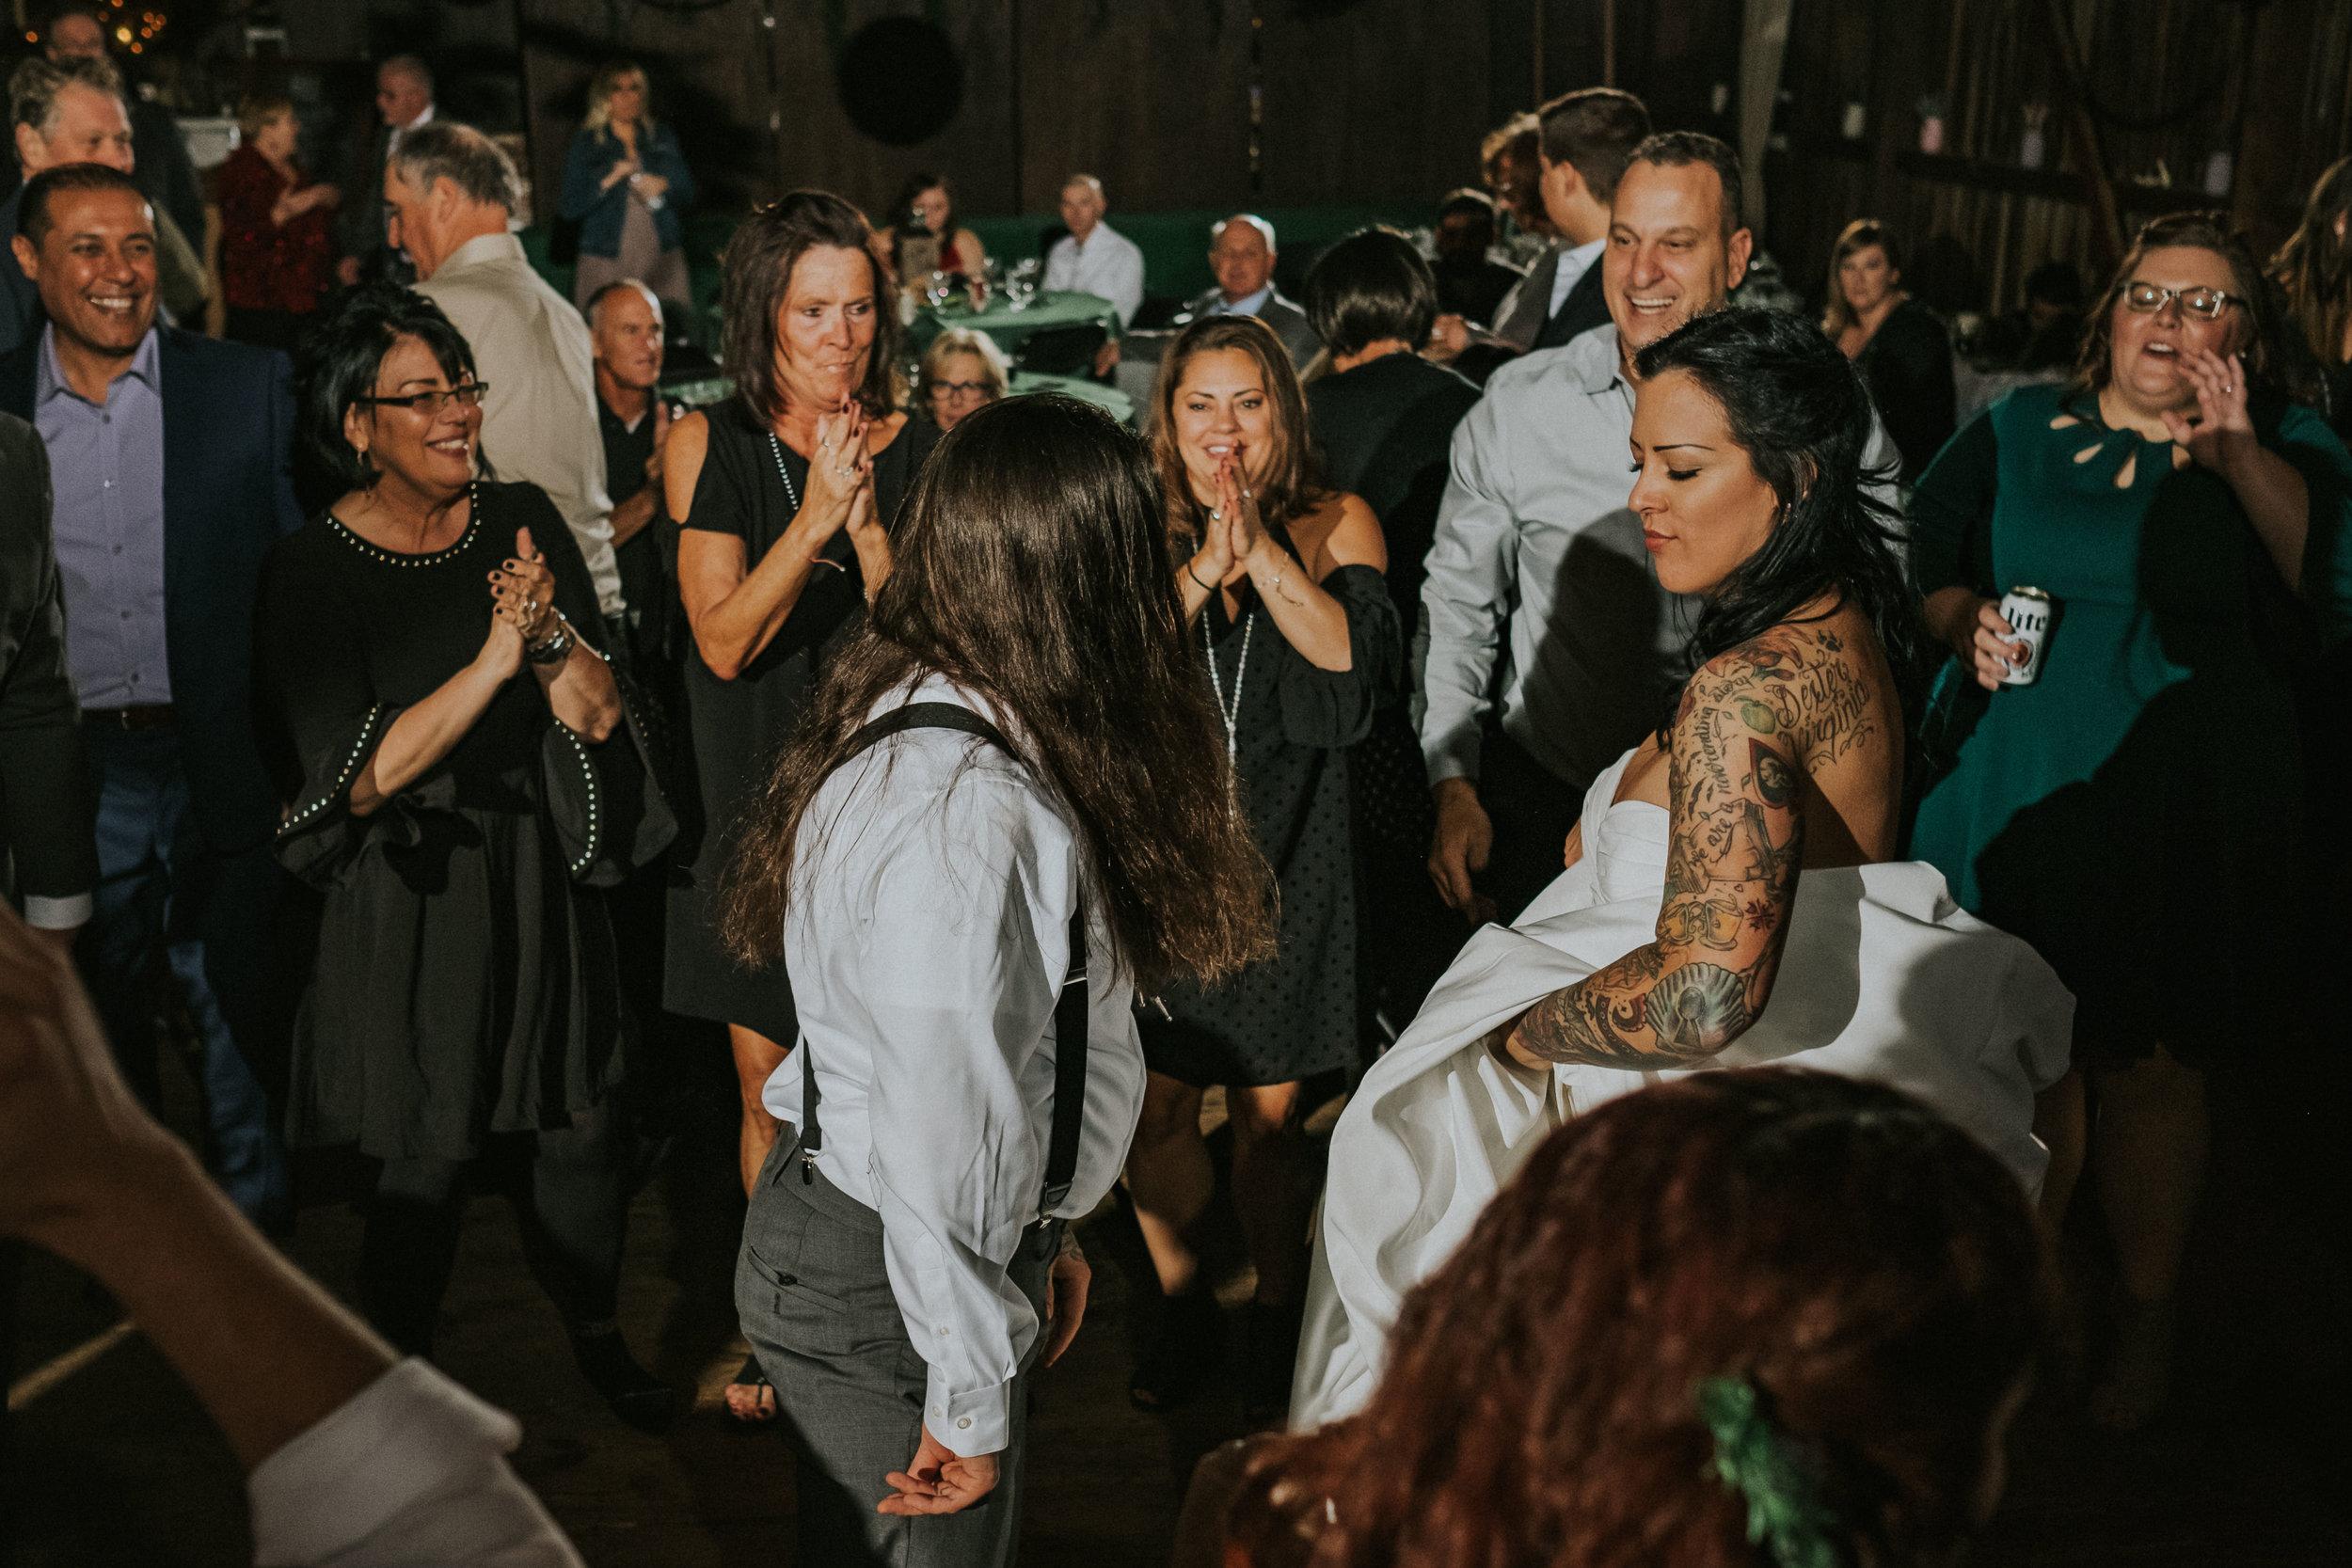 Rodes-Barn-Wedding-Mackenzie-and-Dylan-729.jpg